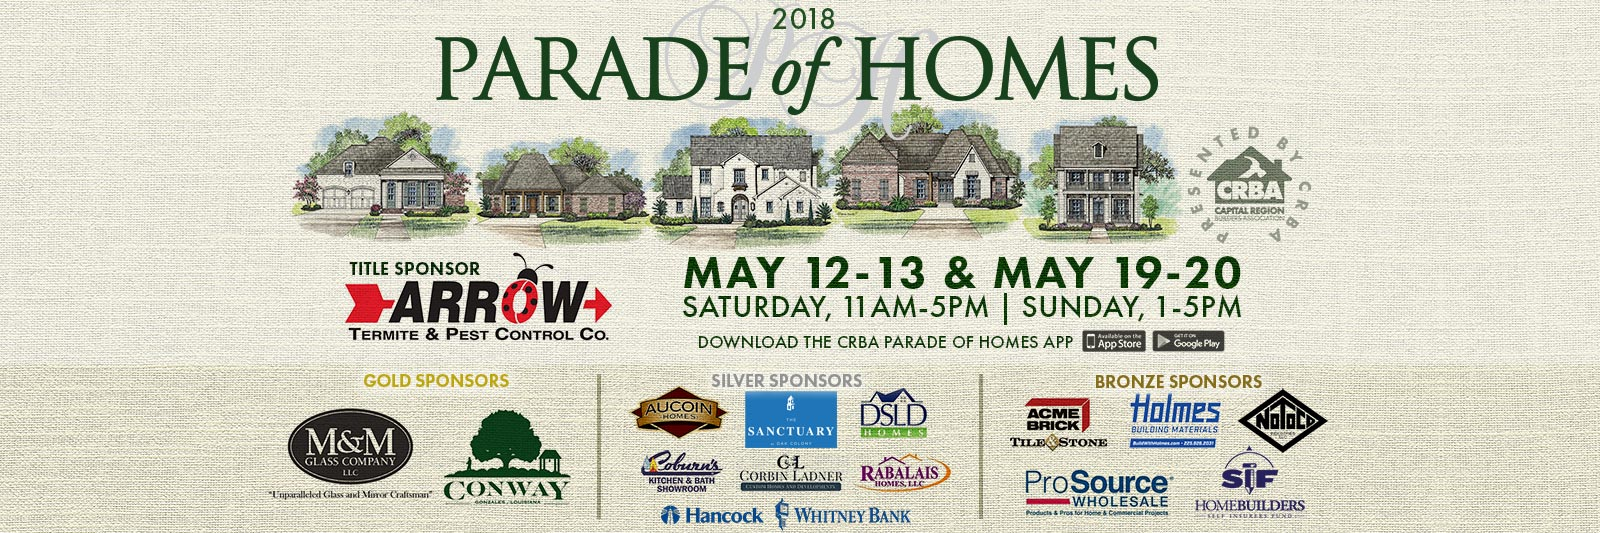 2018 CRBA Parade of Homes